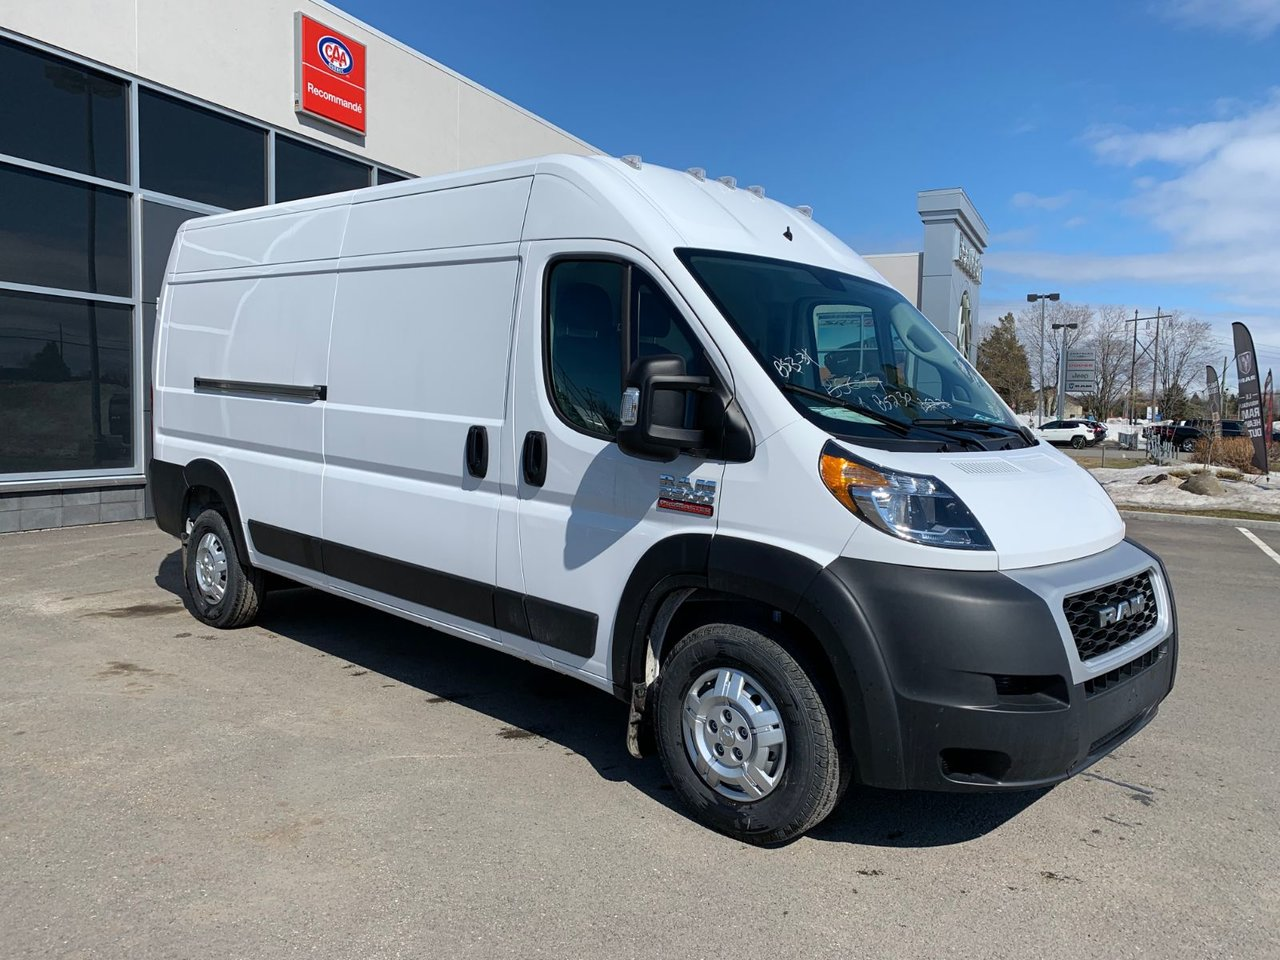 2019 RAM  ProMaster Cargo Van High Roof 159 in. WB